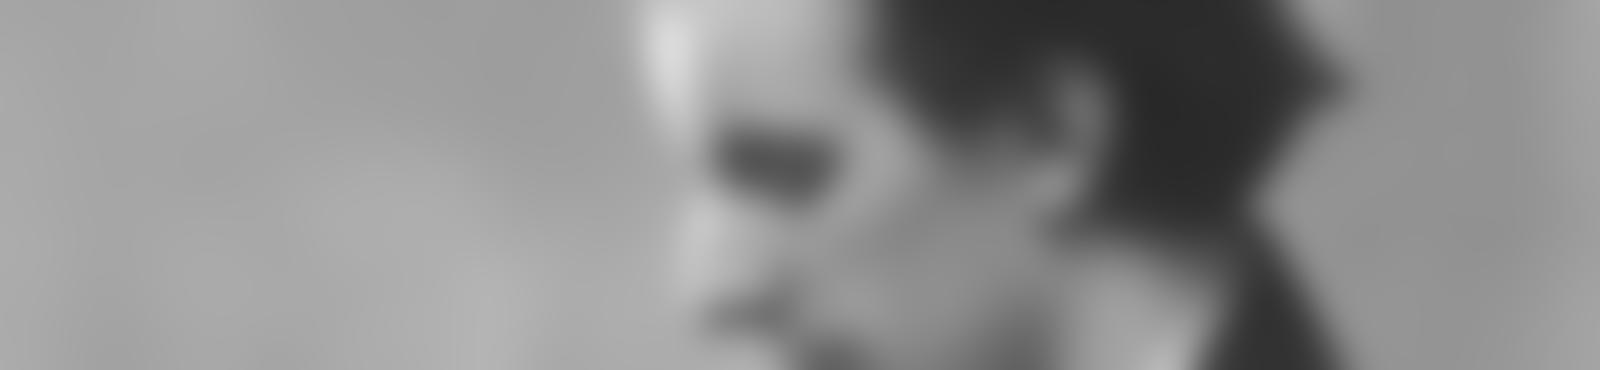 Blurred a594dd4b b7c6 4e81 a505 f3c17cfdffc3